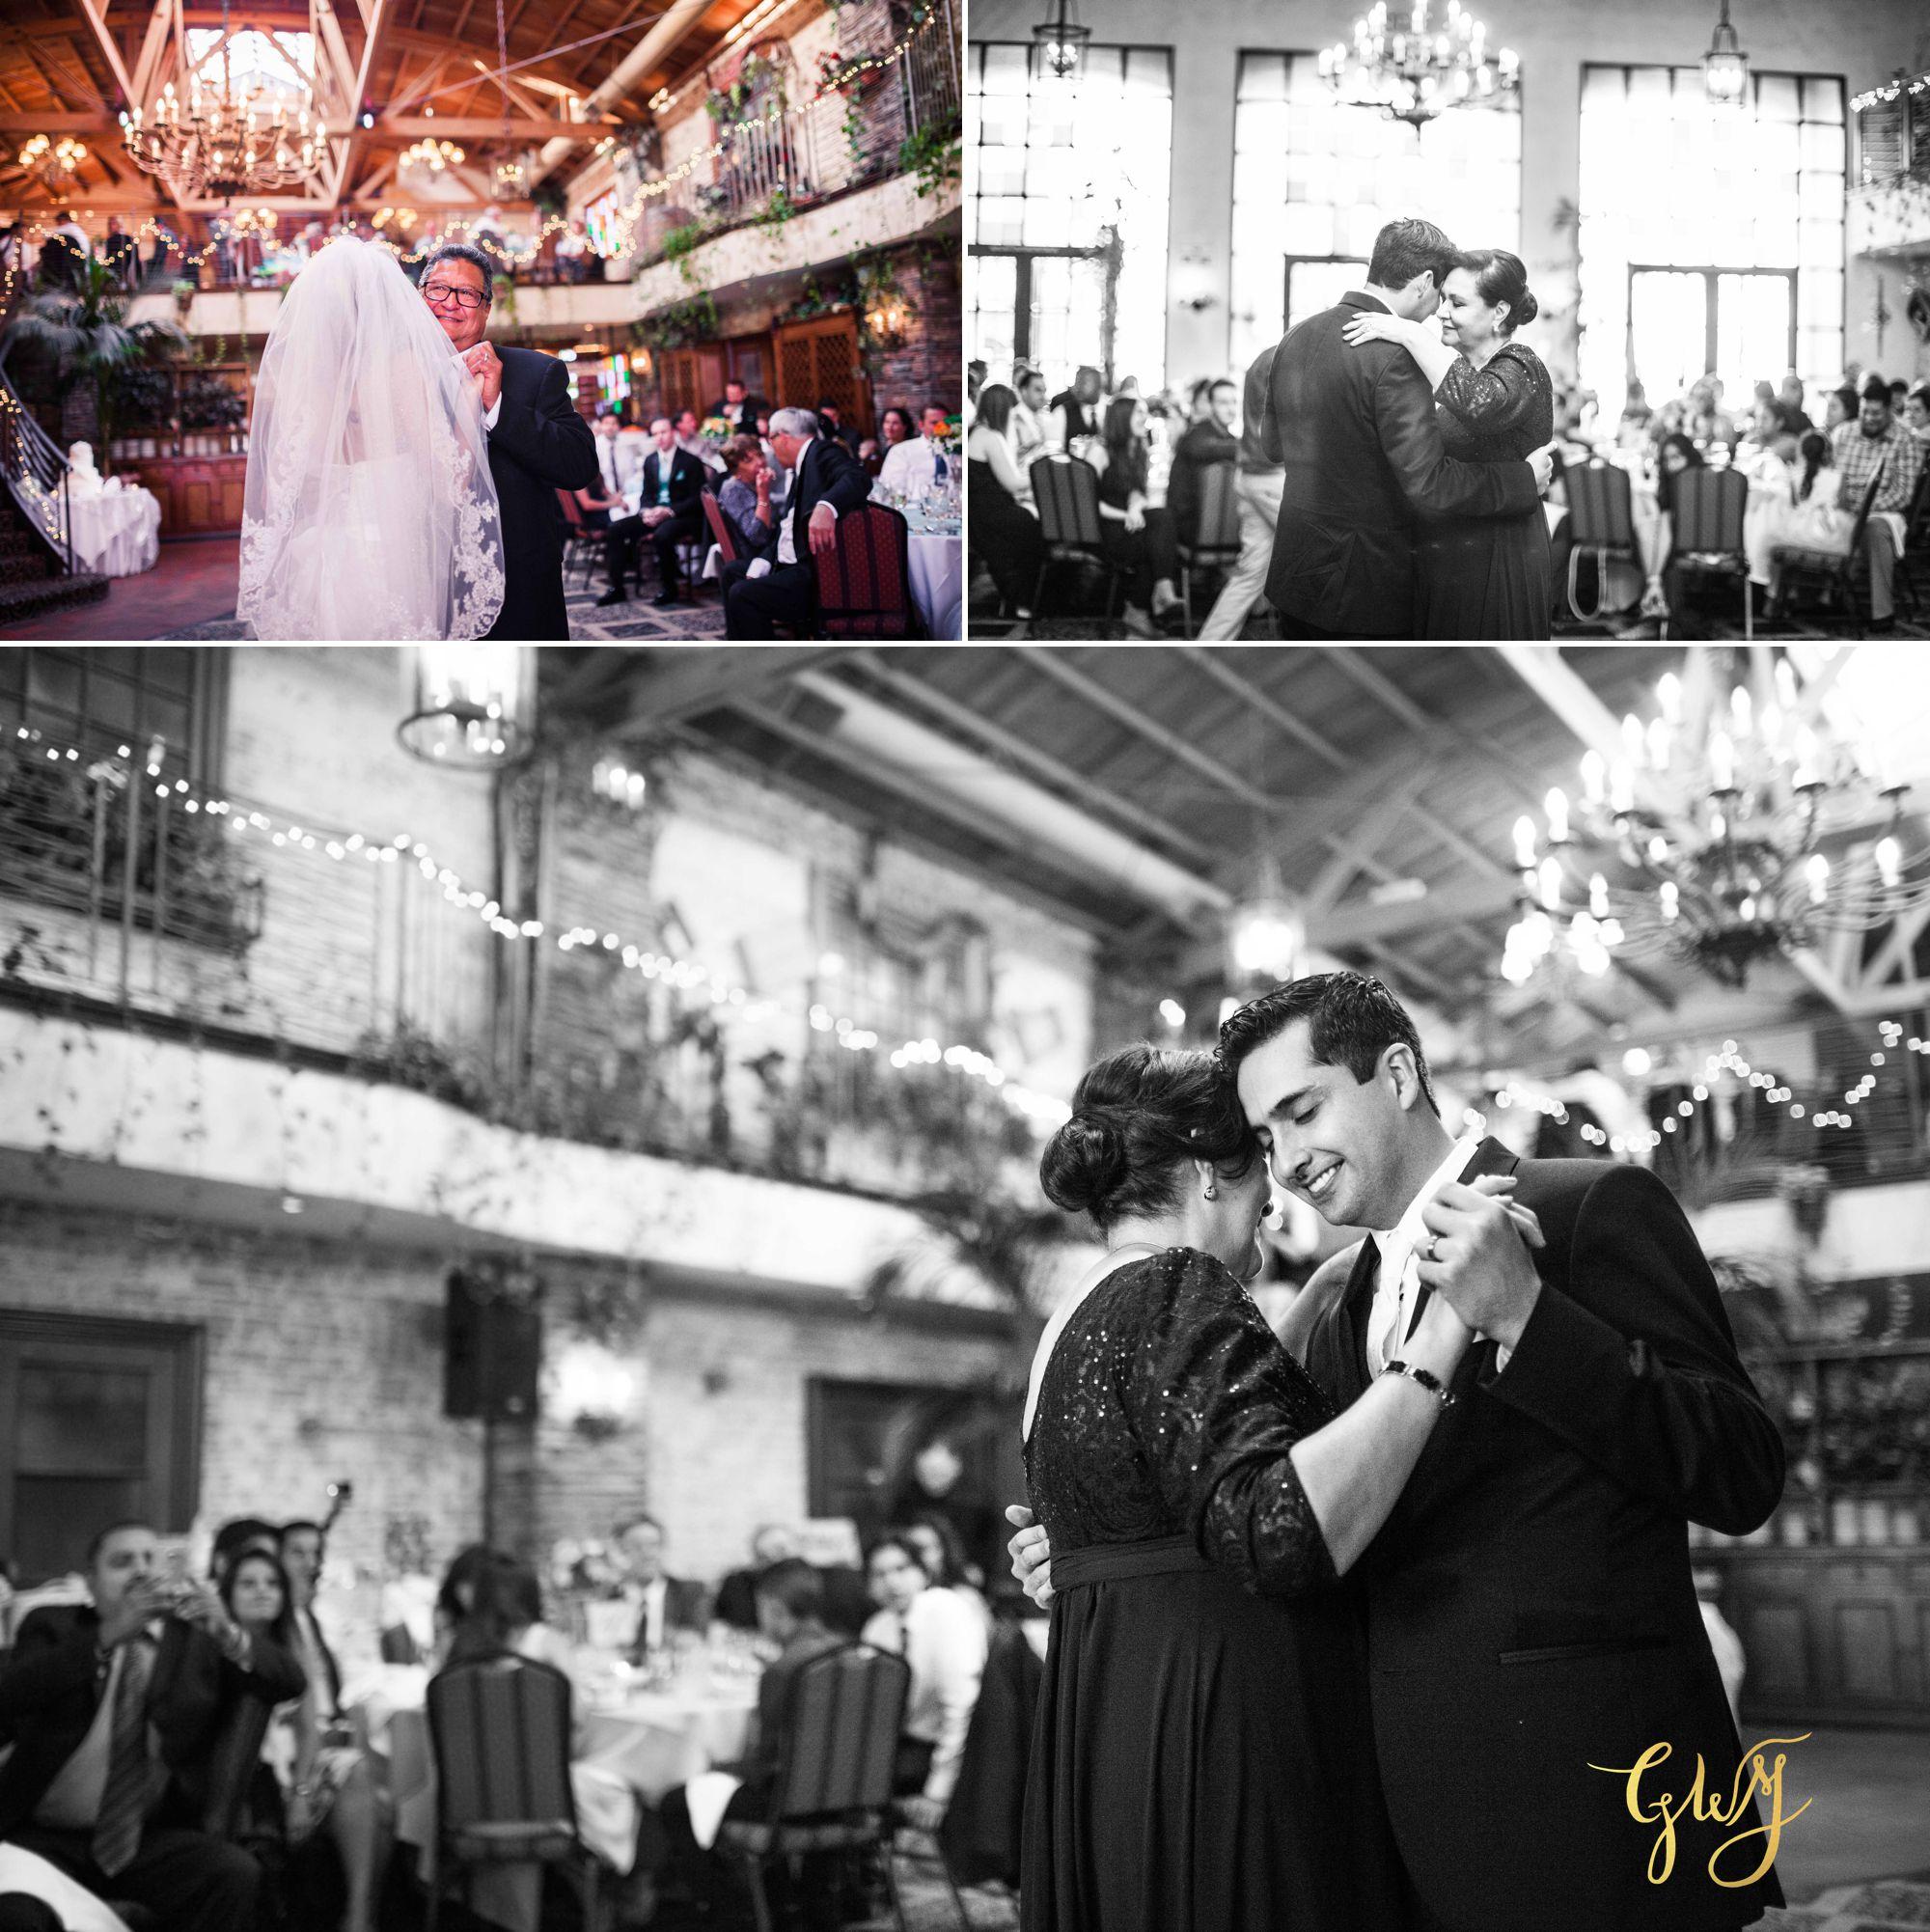 Krista + Roberto Wedding (watermark) 185048.jpg